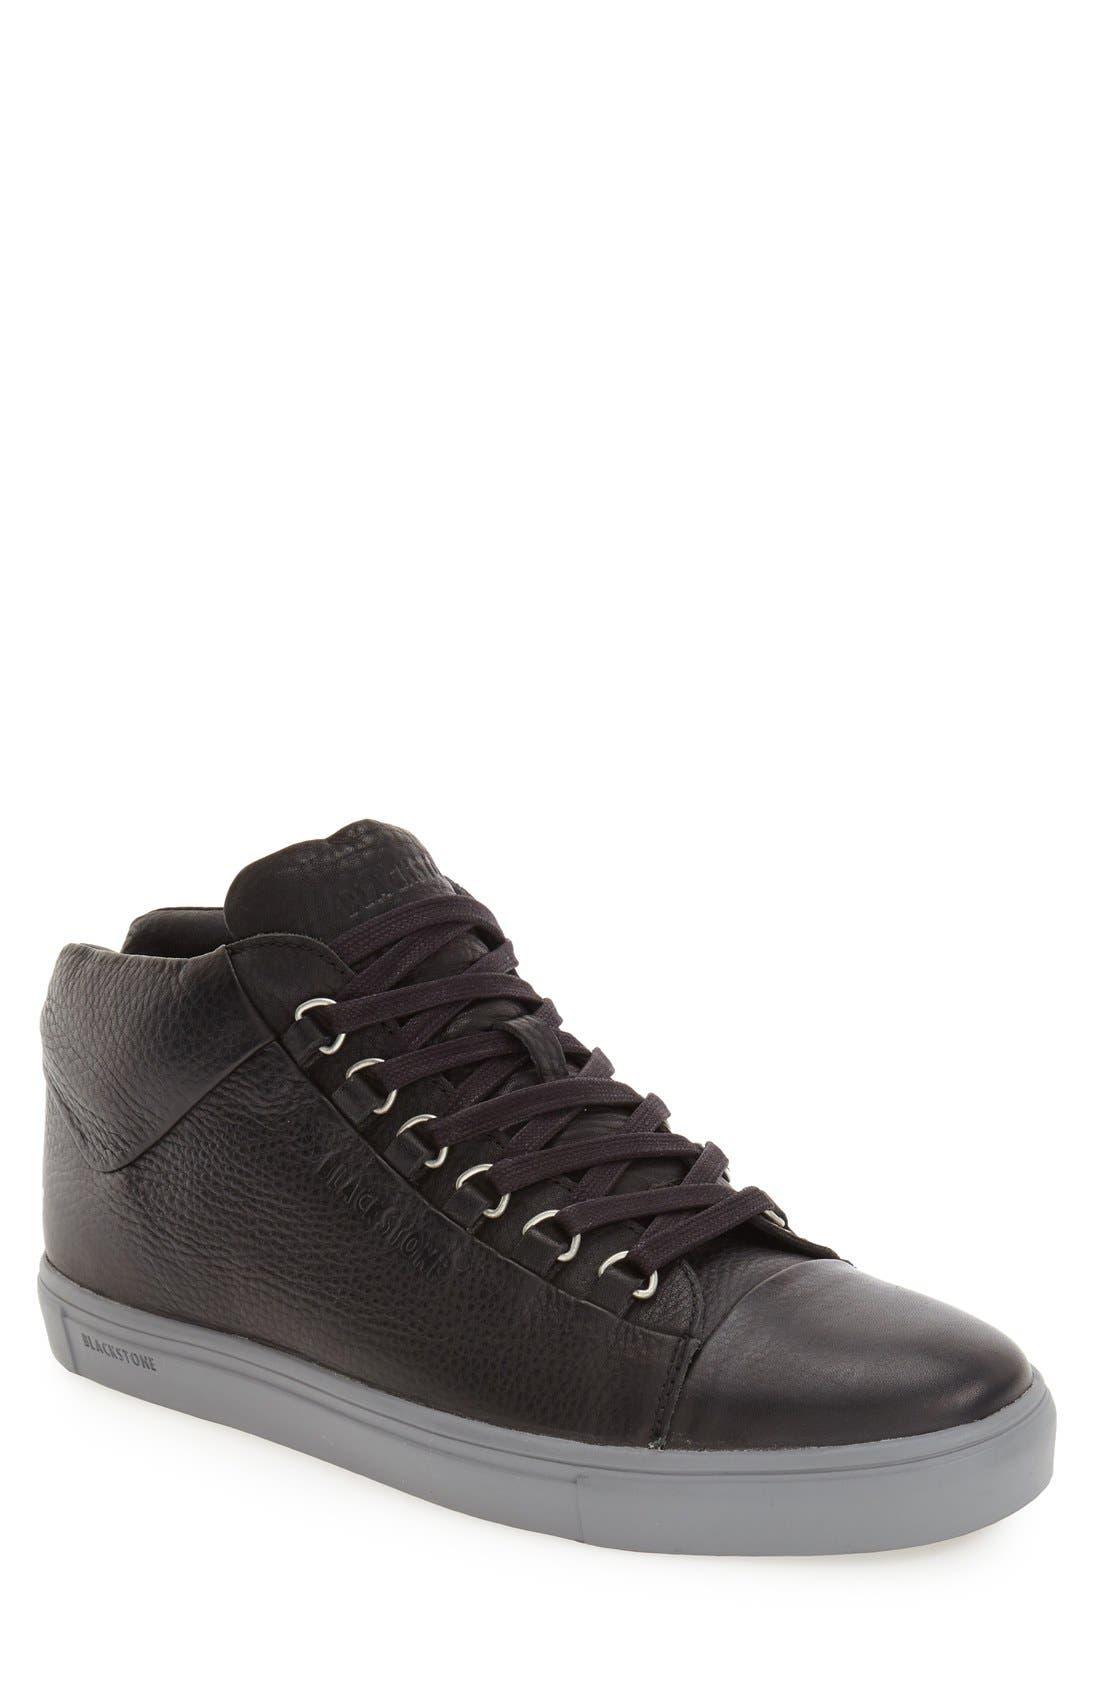 BLACKSTONE 'KM20' Sneaker